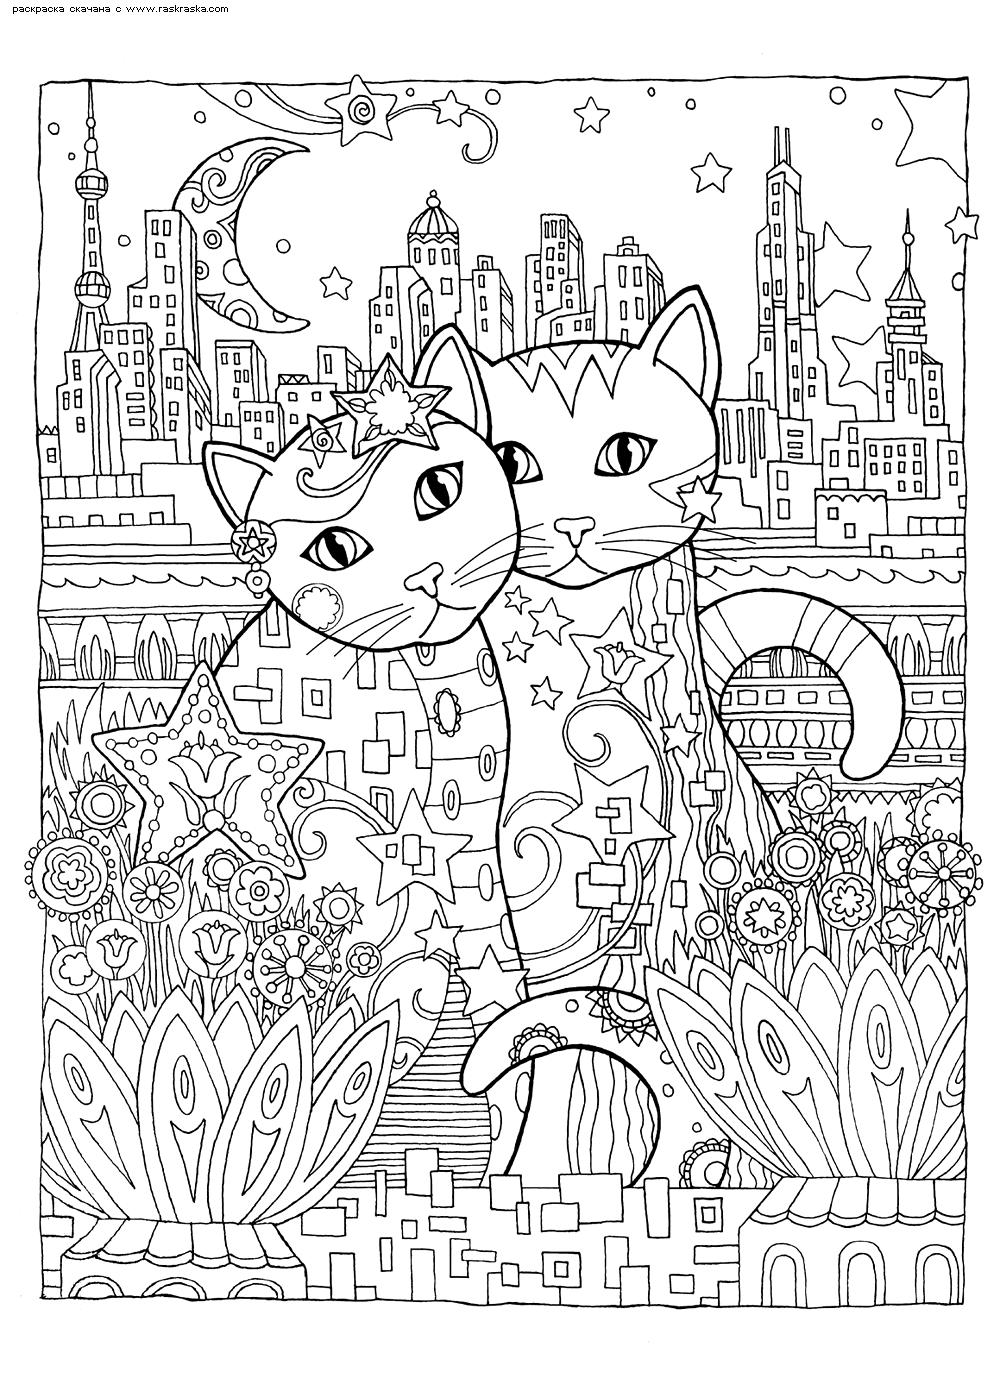 Раскраска Кошки в городе | Раскраски антистресс Кошки ...